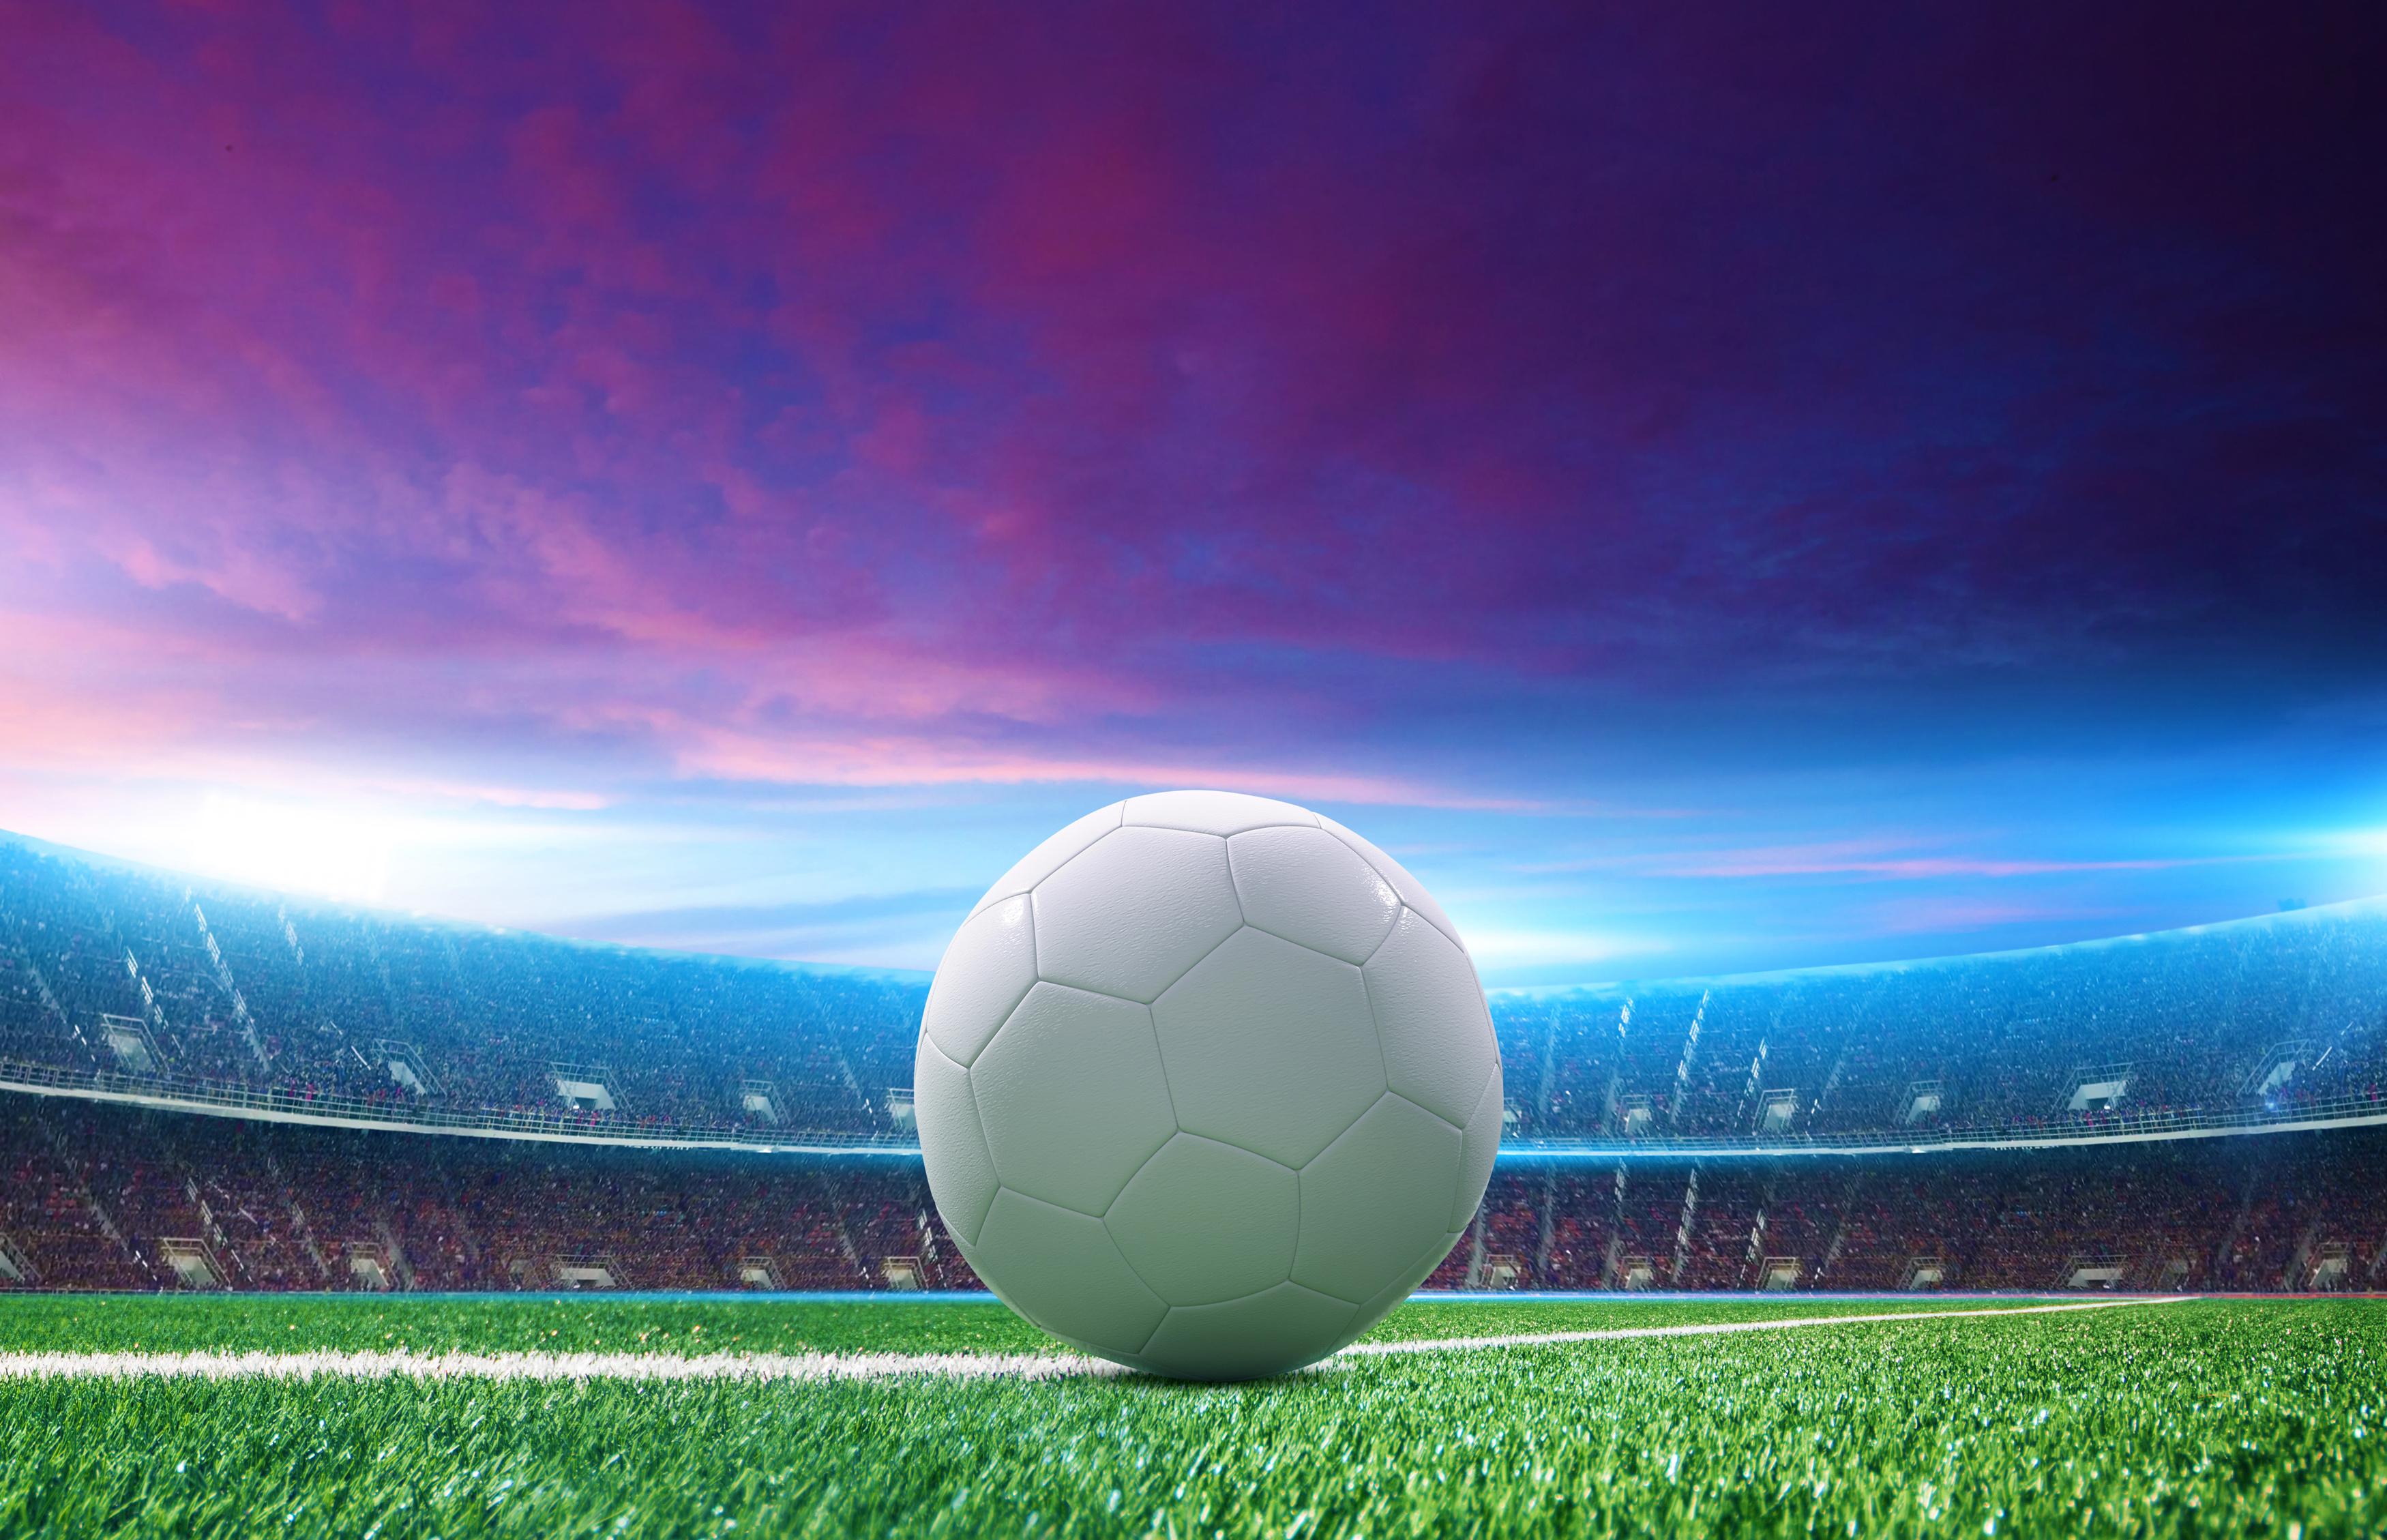 Football Stadium 4k, HD Sports, 4k Wallpapers, Images ...